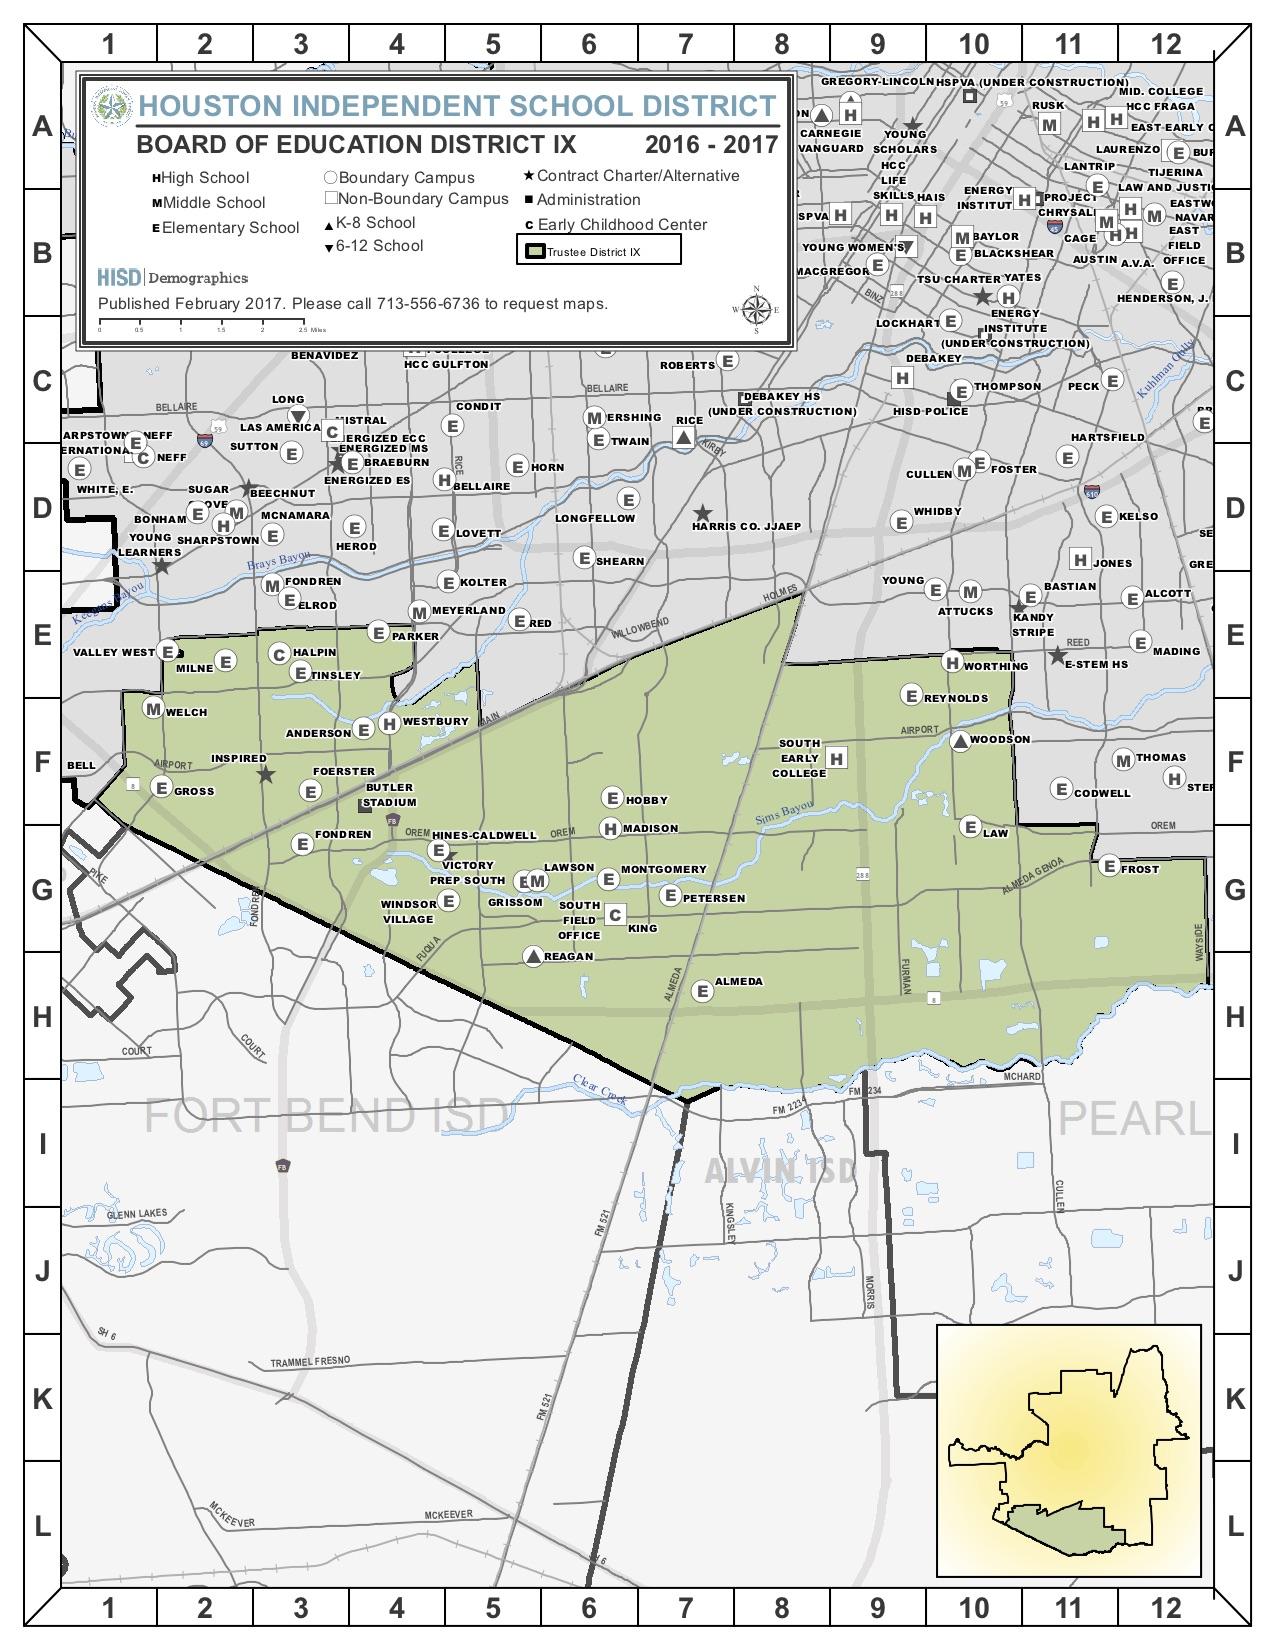 District 9 - Adams, Brown, Monroe